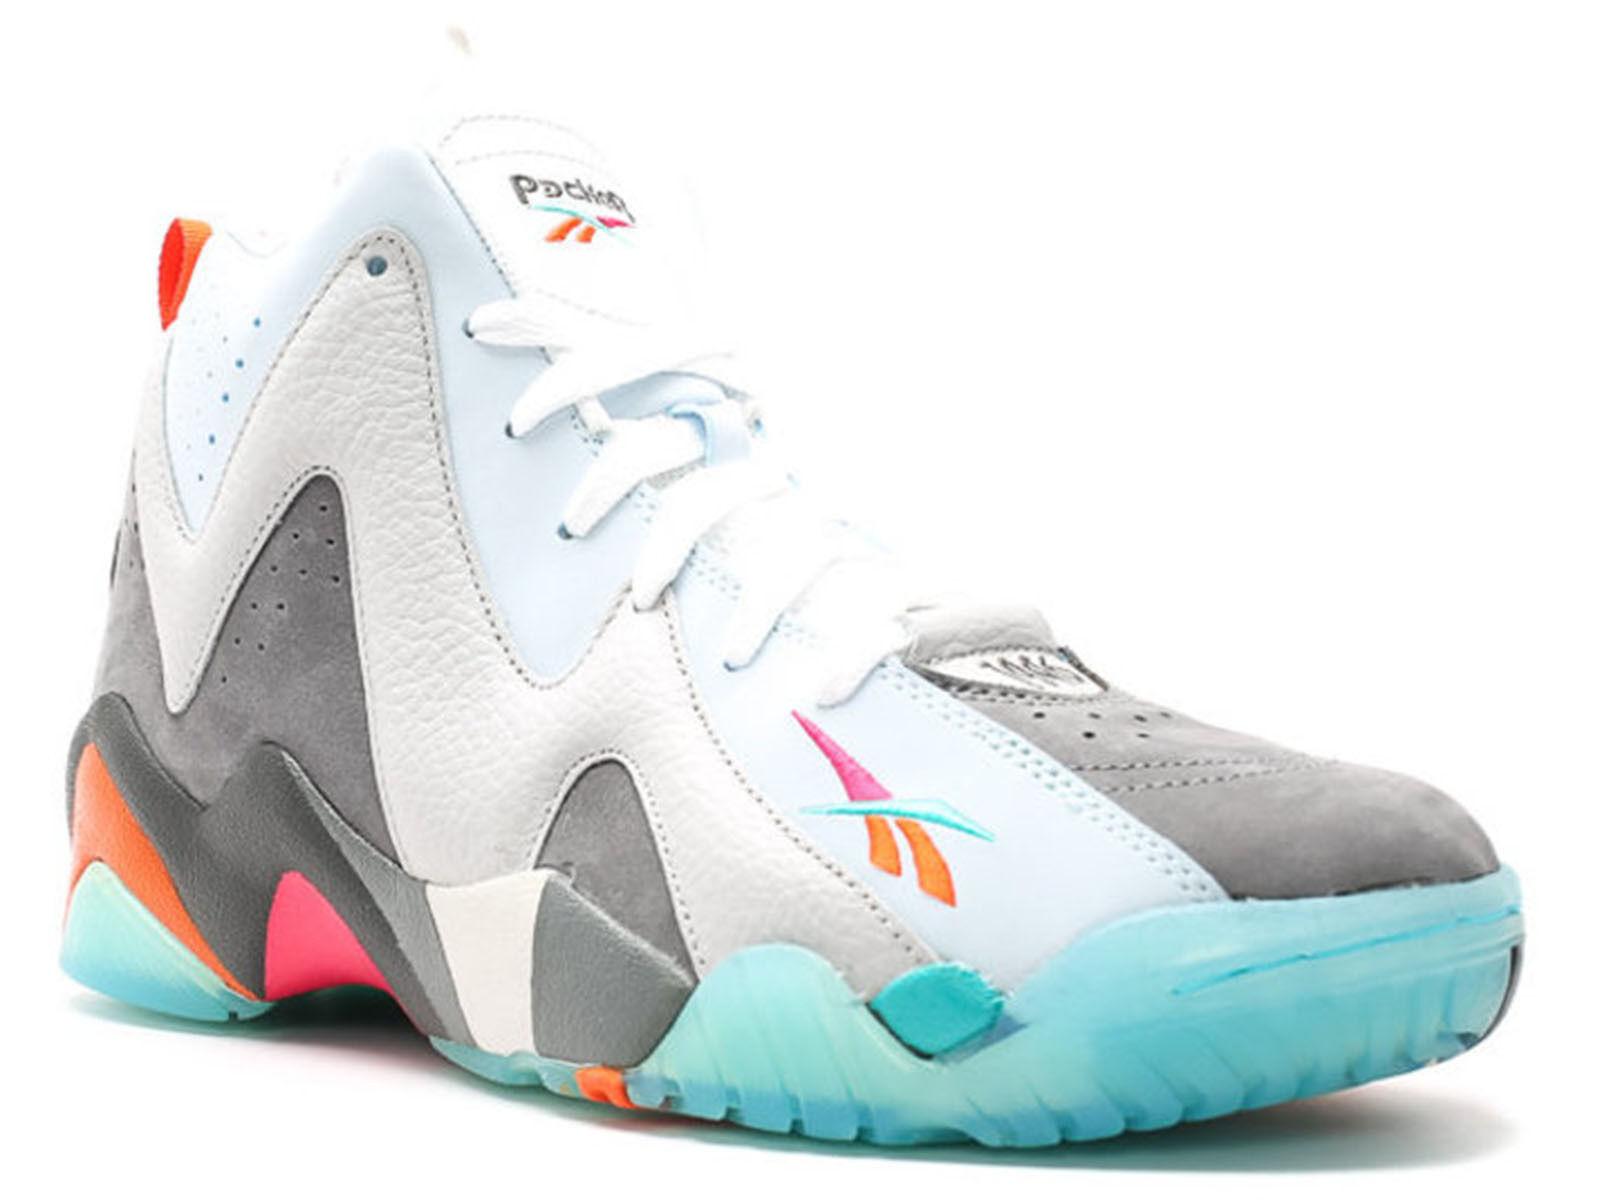 Brand New Reebok Kamikaze II Mid Men's Athletic Fashion Sneakers [V63452]